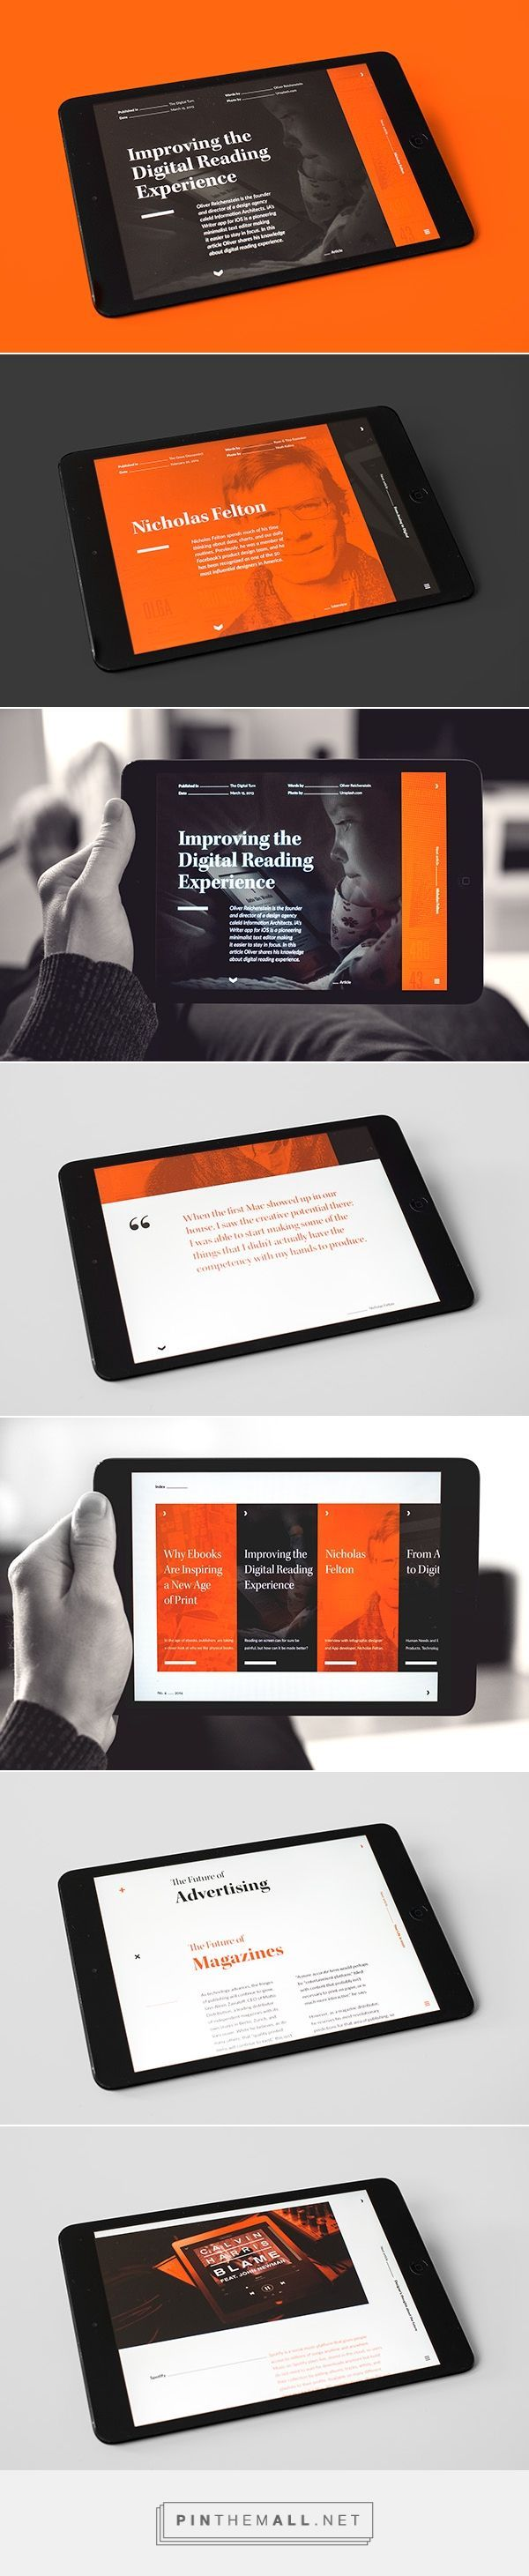 Verso – Digital Magazine; Abduzeedo Design Inspiration || #inspiration #orange